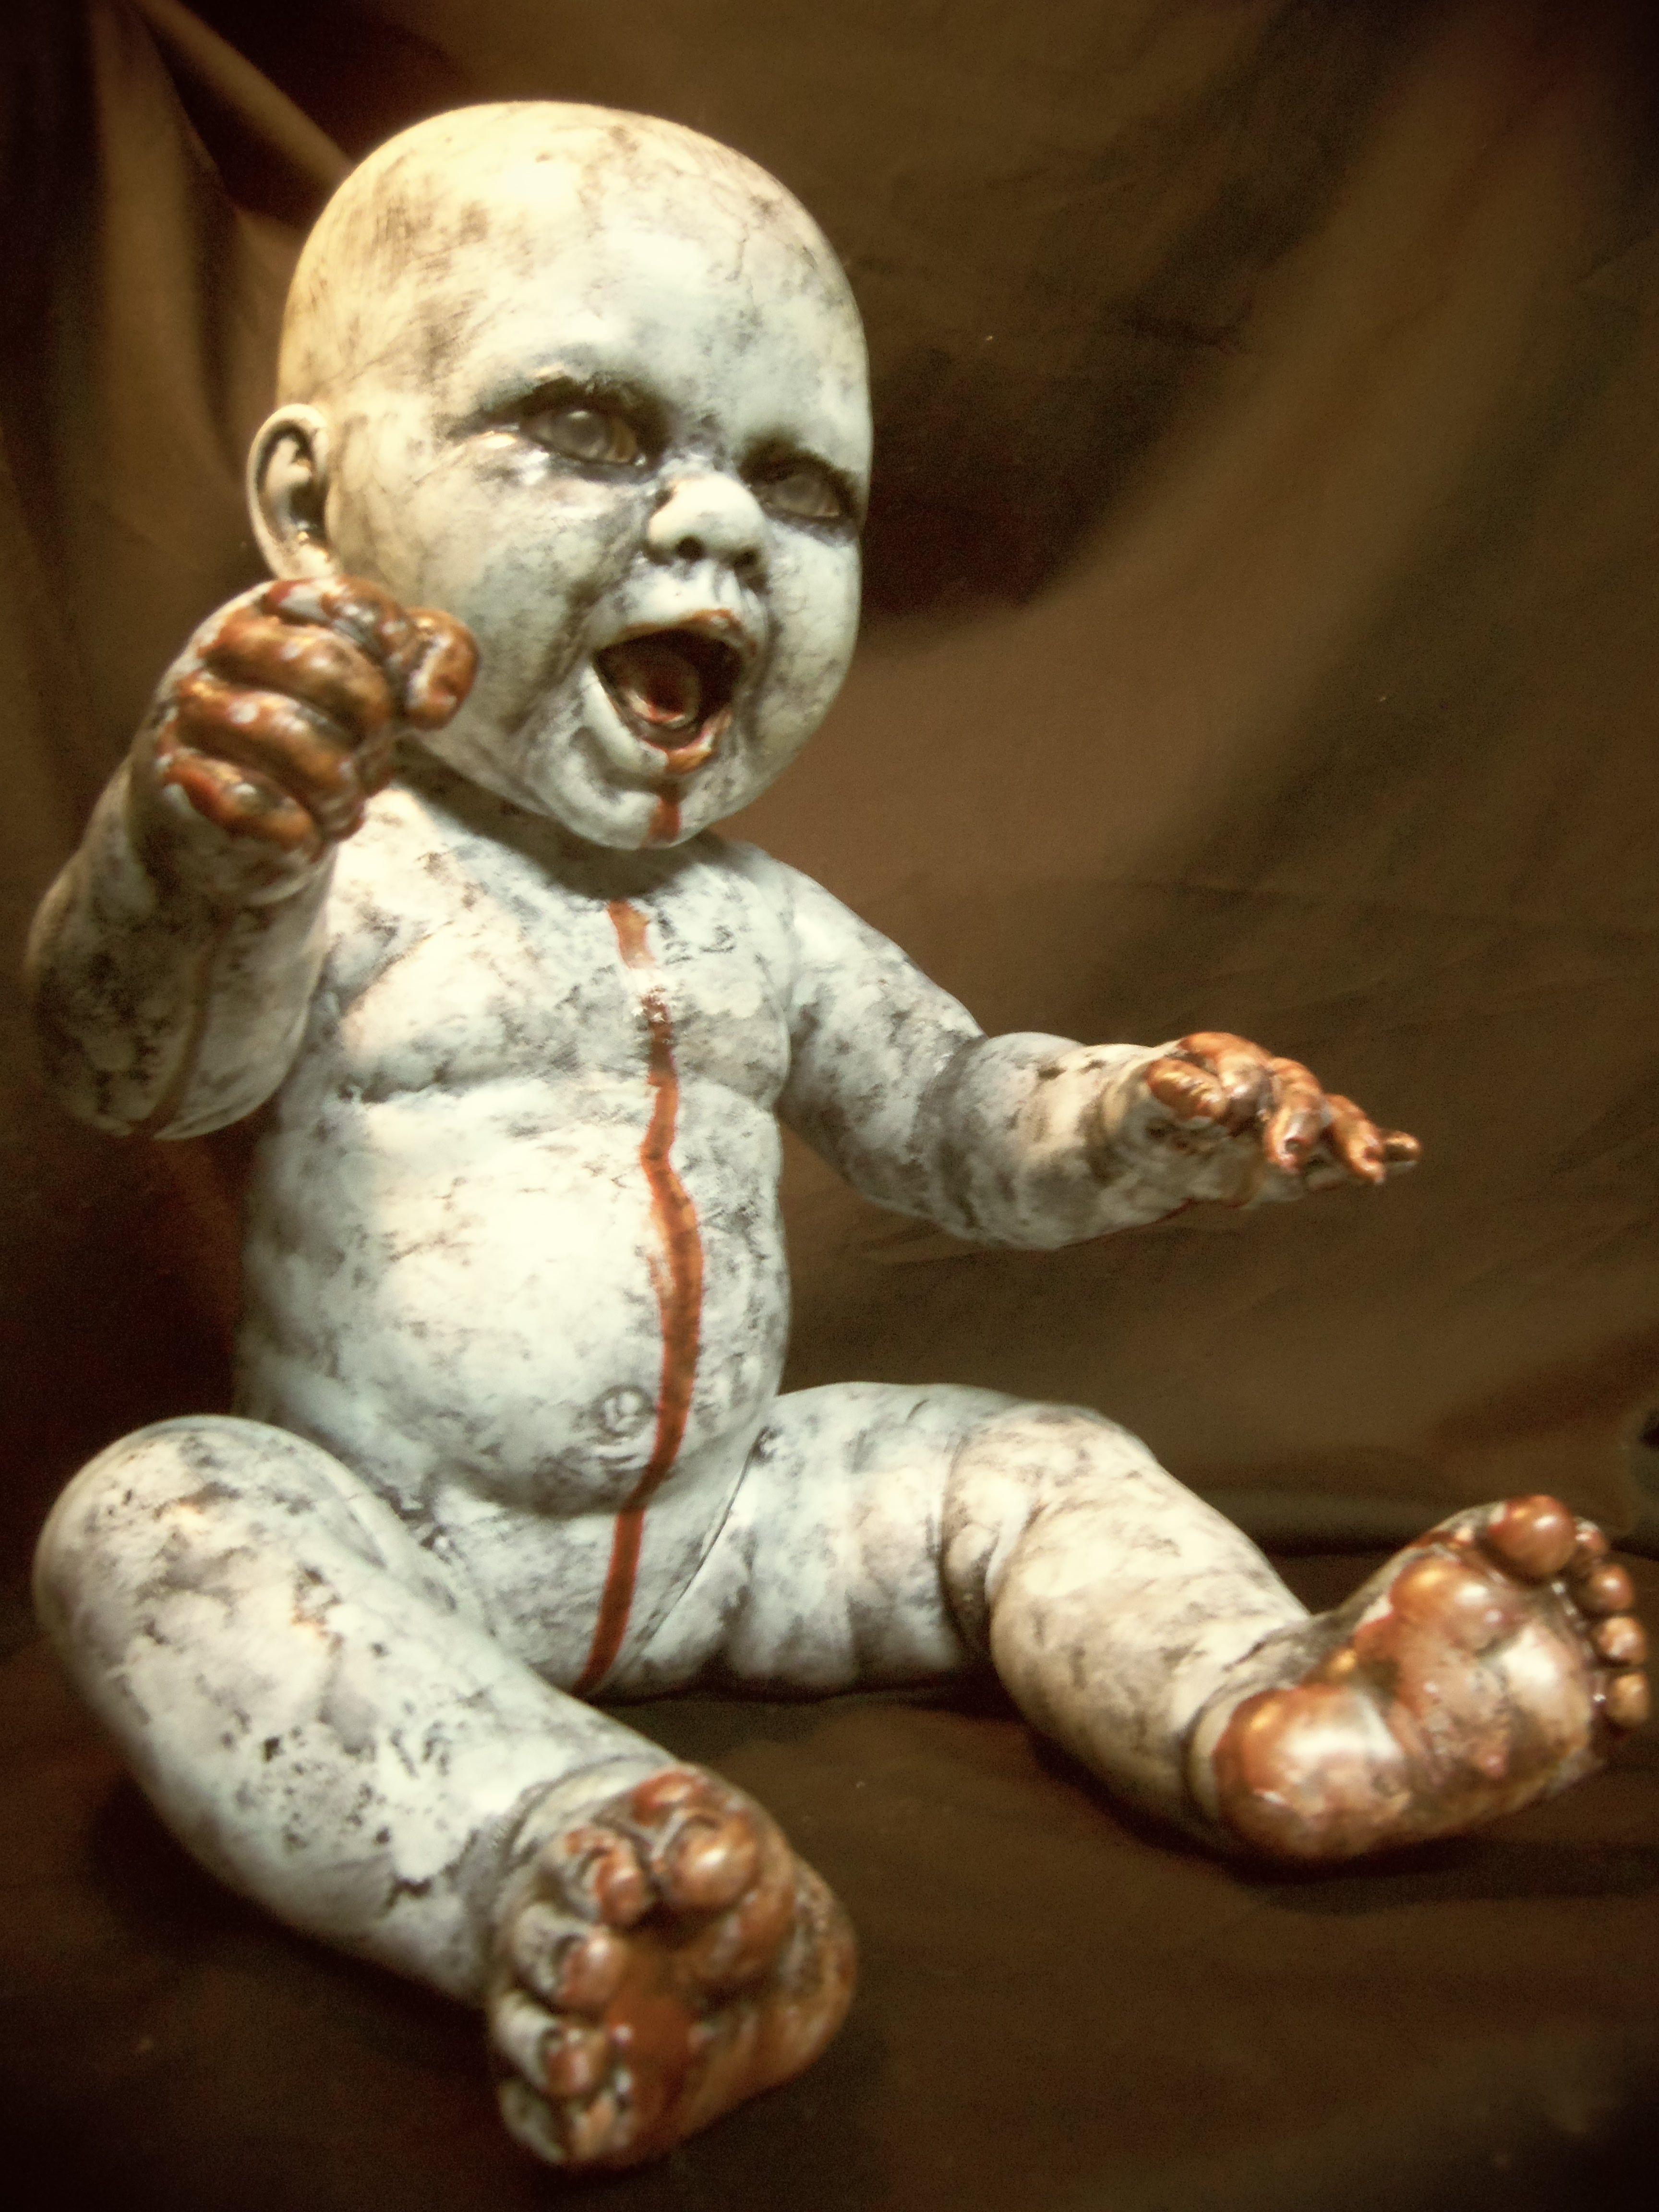 Zombie baby doll Creepy baby dolls, Scary dolls